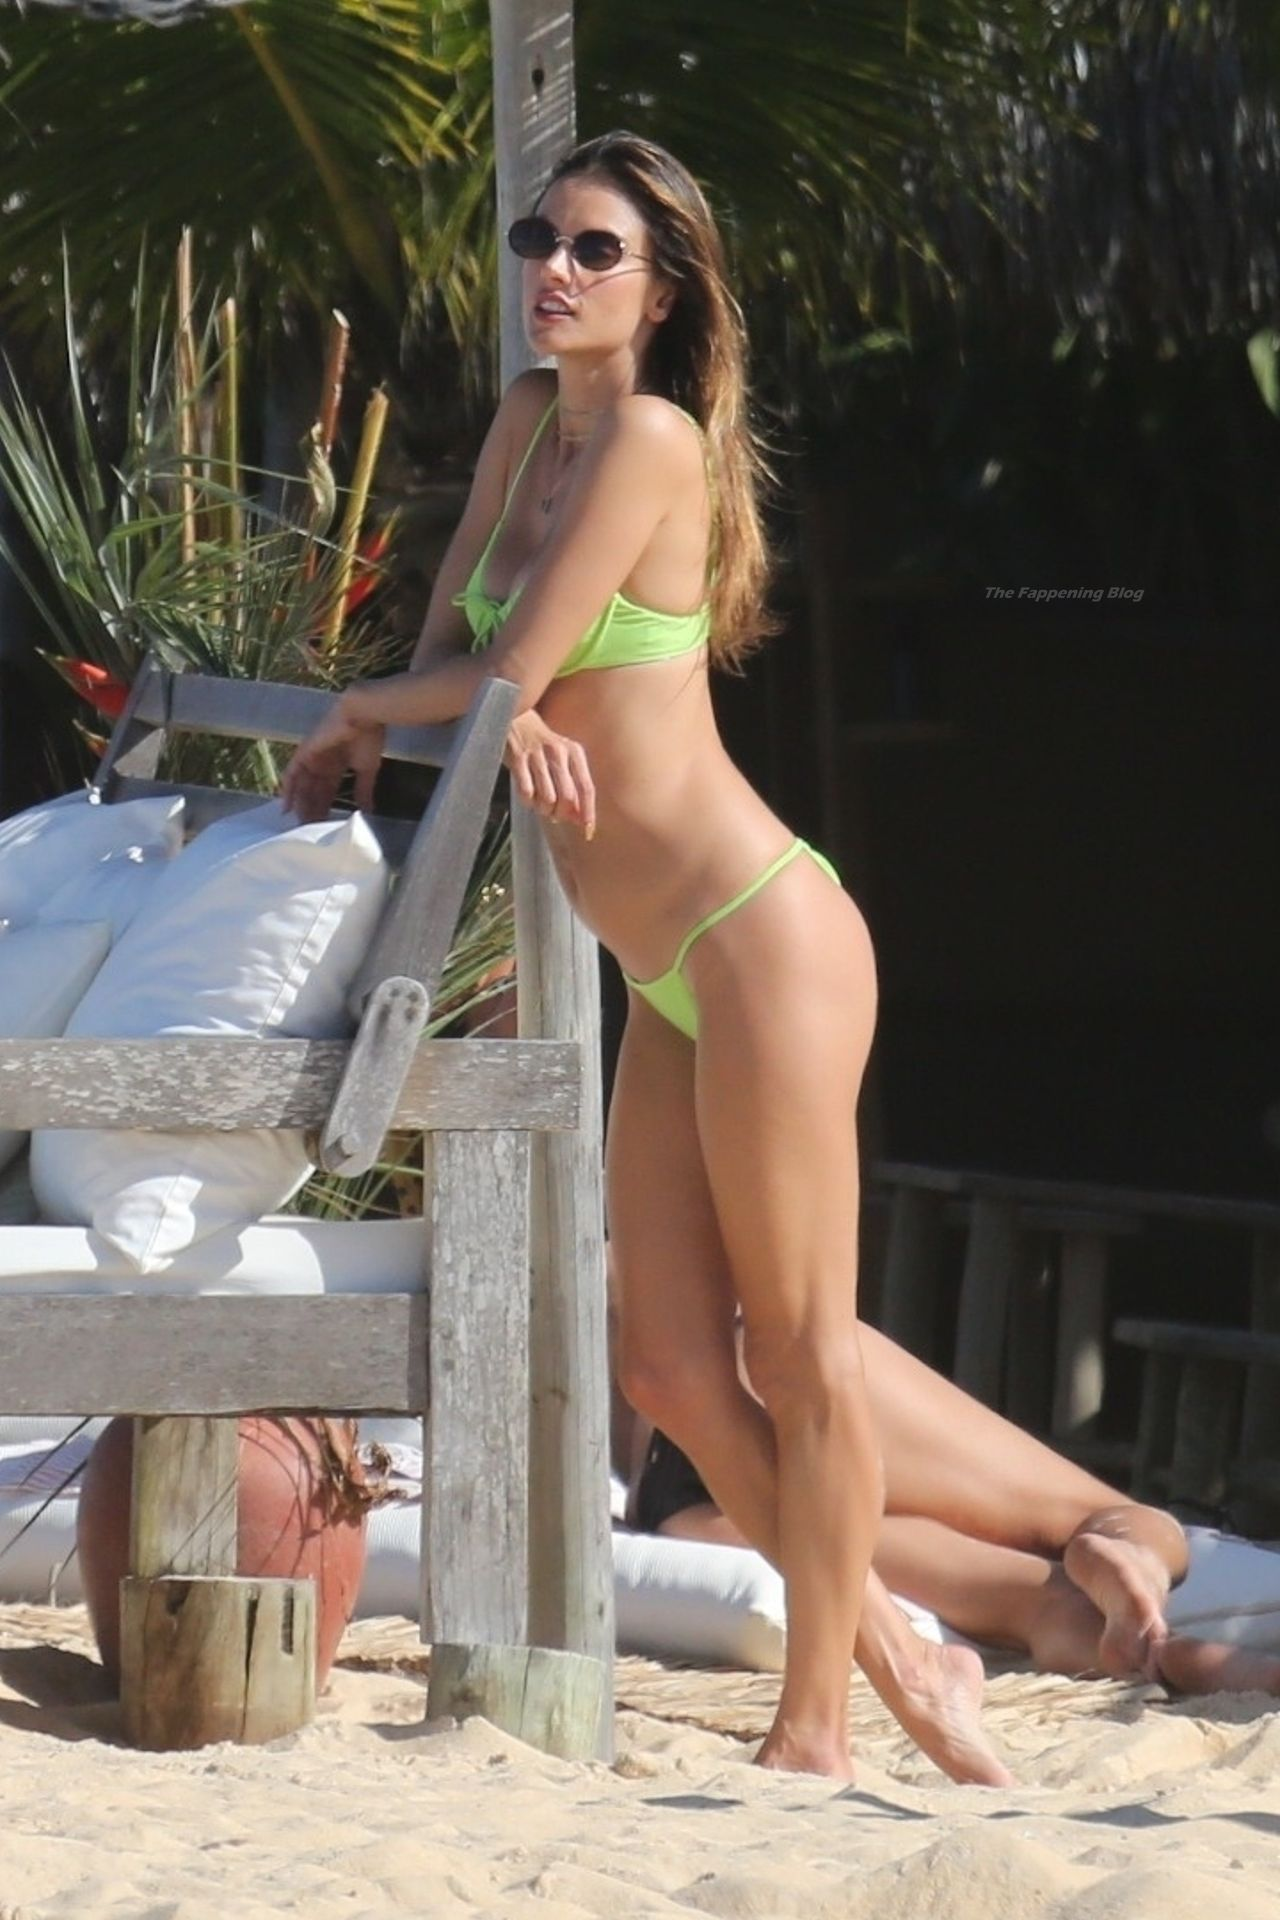 Alessandra-Ambrosio-Sexy-The-Fappening-Blog-201.jpg